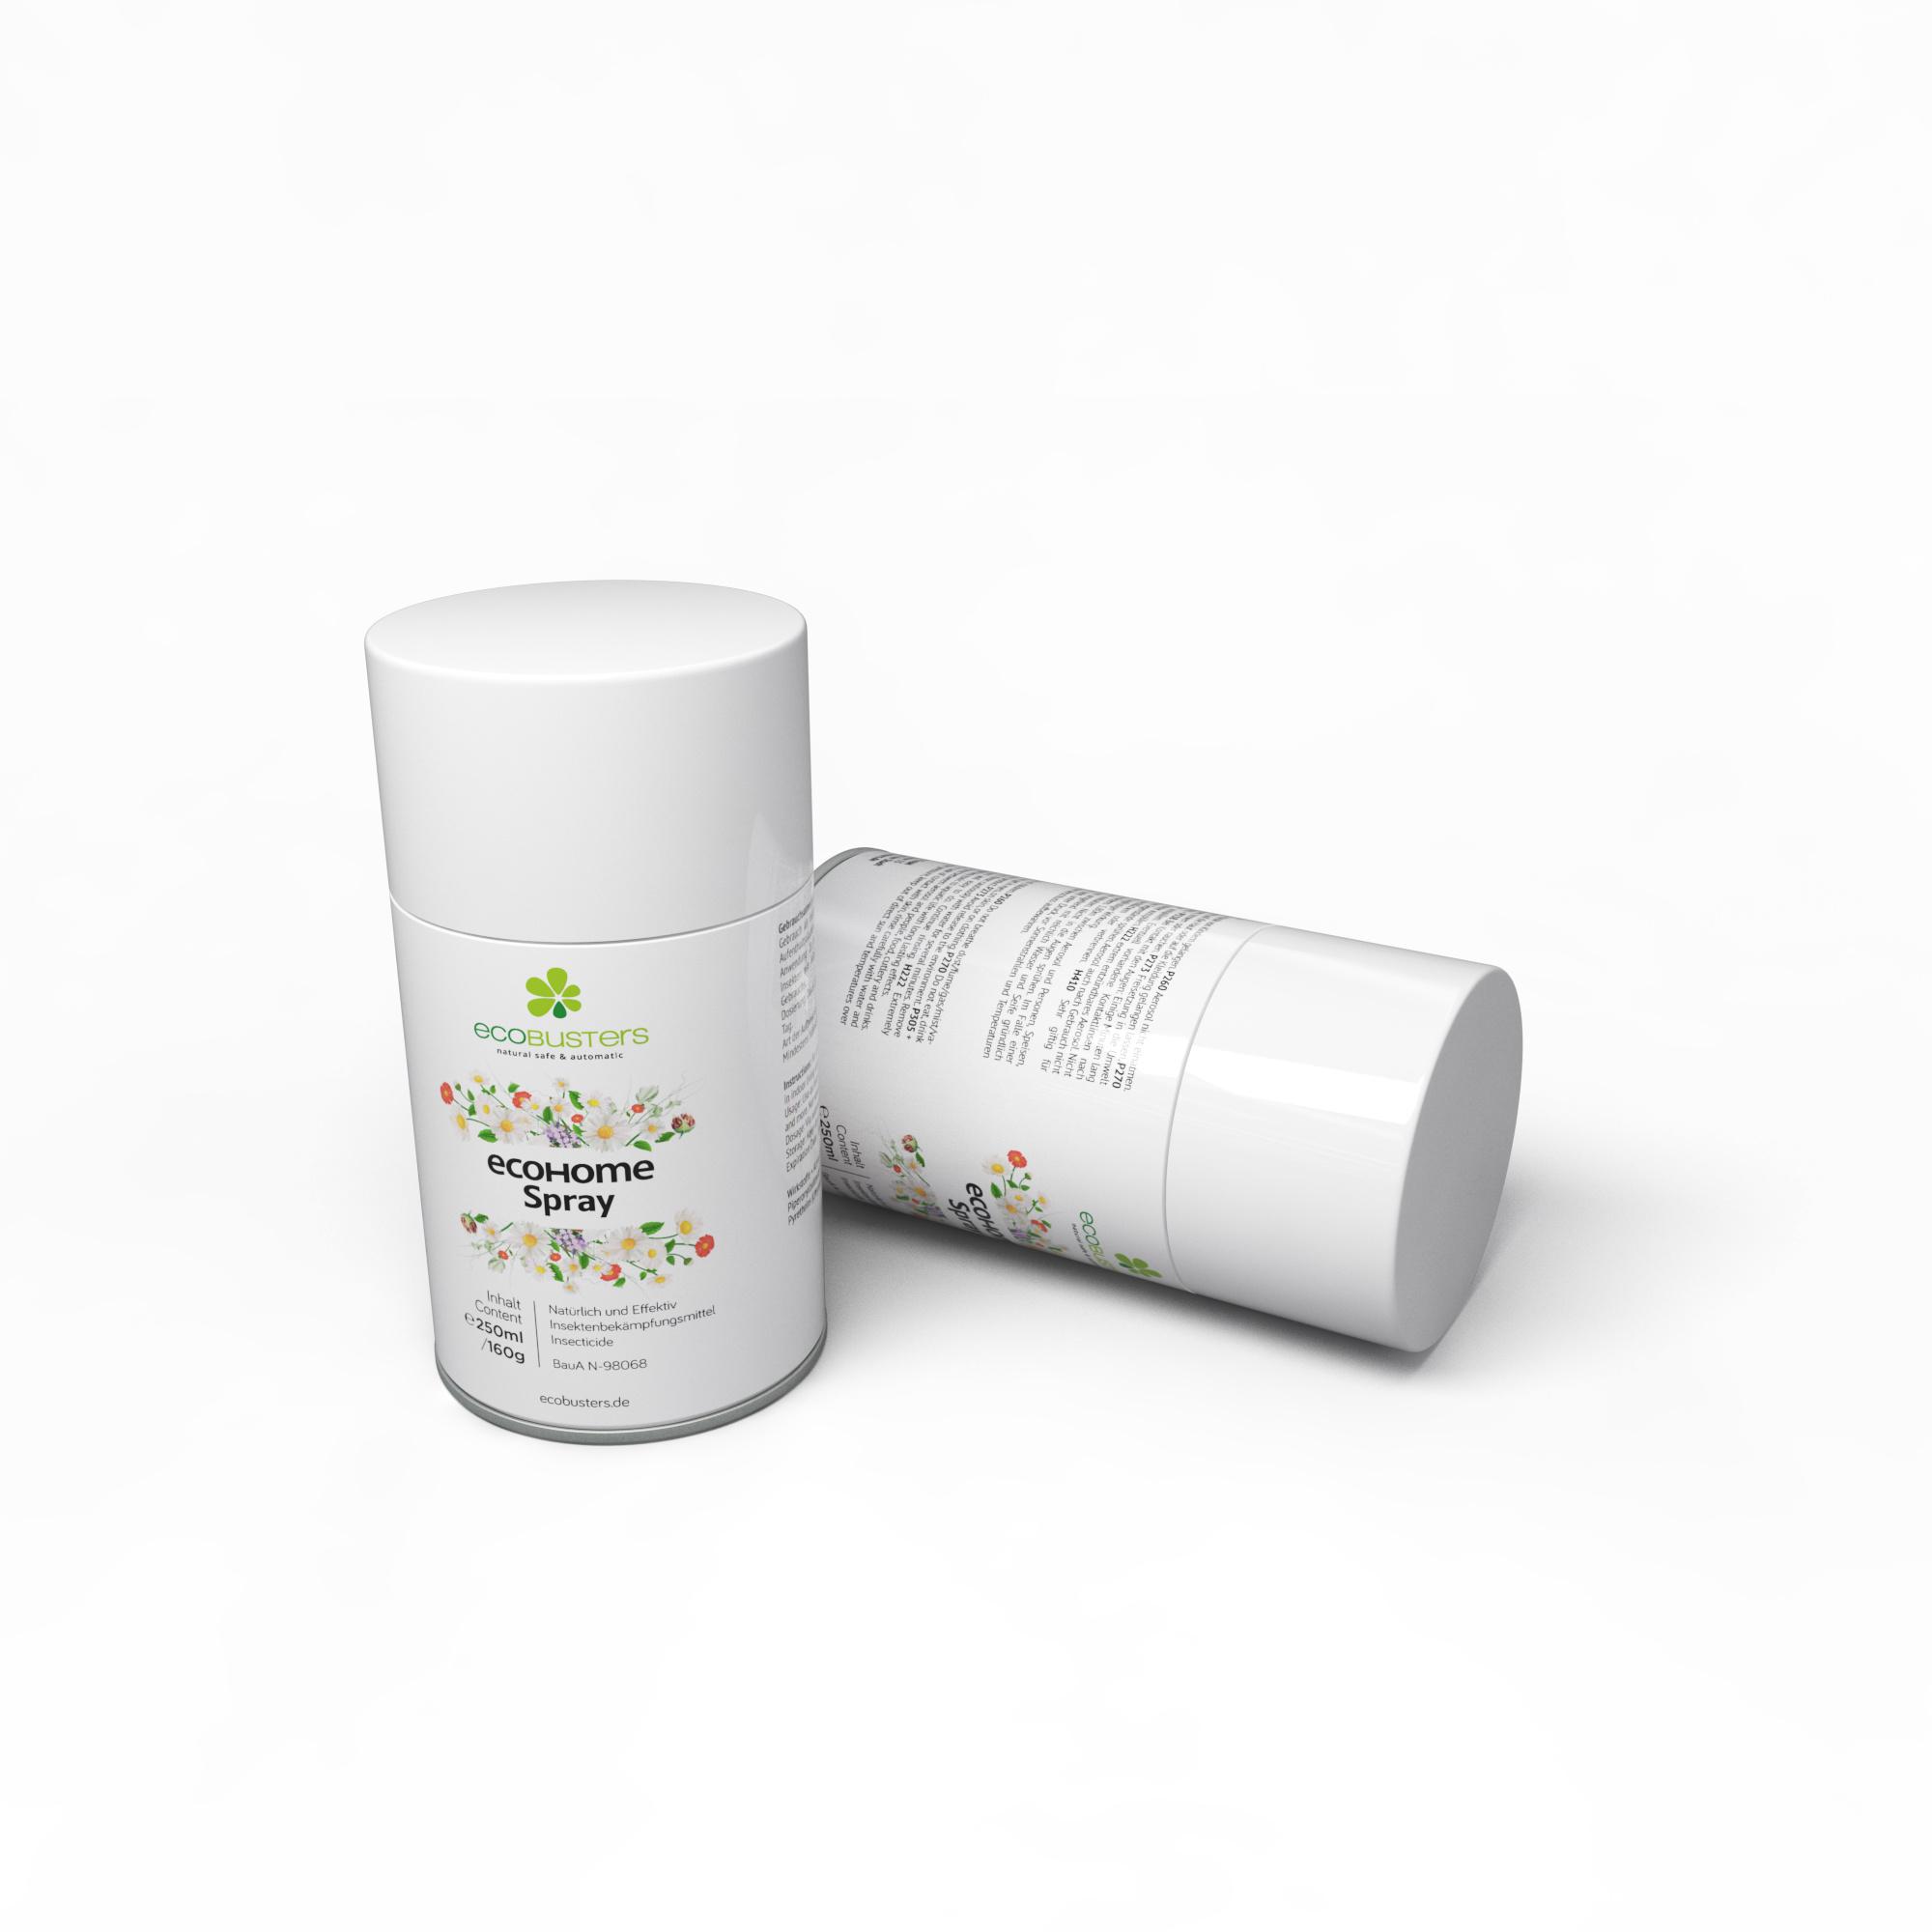 2x EcoHome-Spray